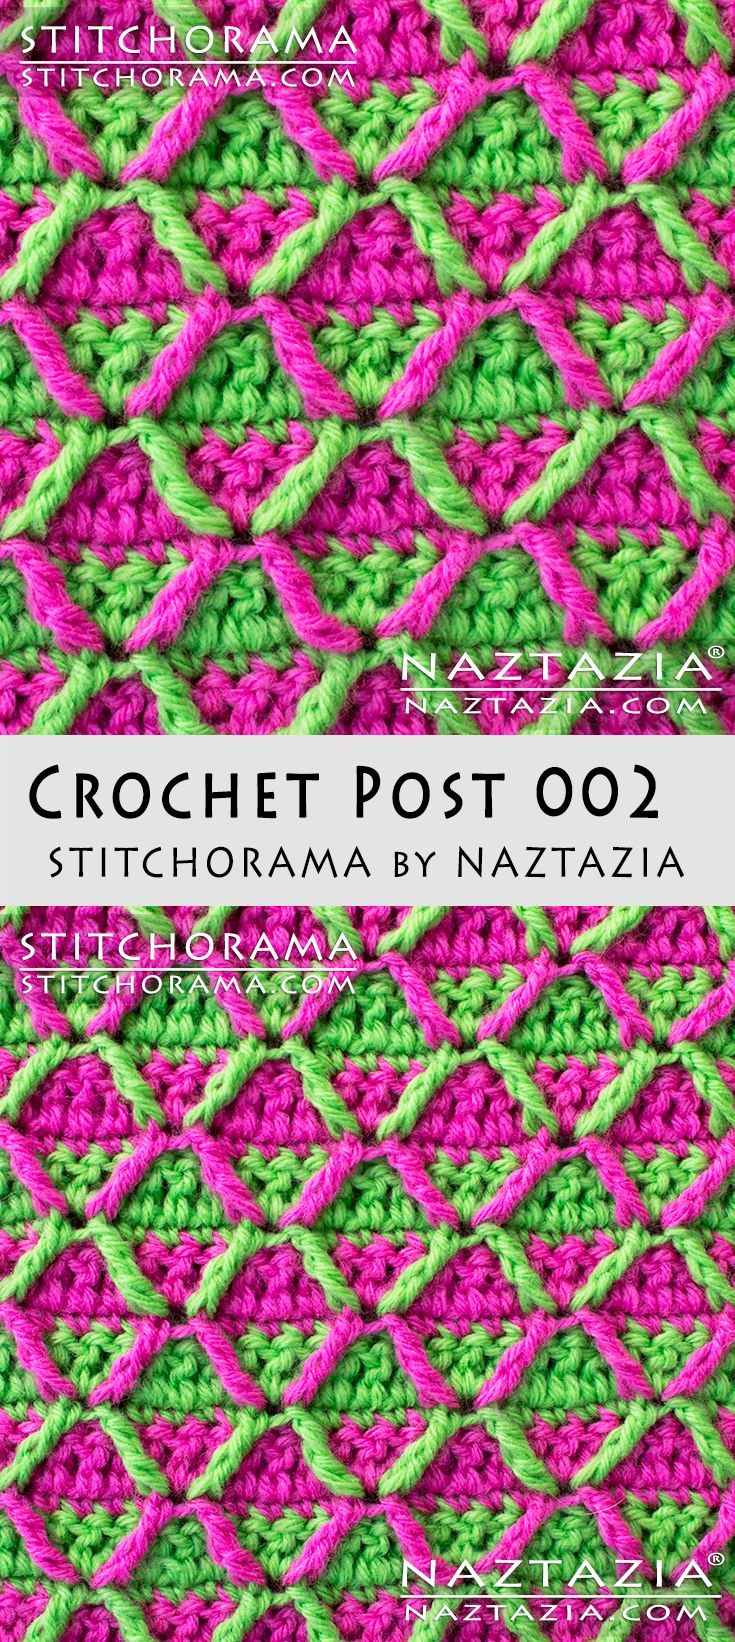 Crochet Post 002 Stitchorama by Naztazia Free Pattern & DIY Tutorial ...